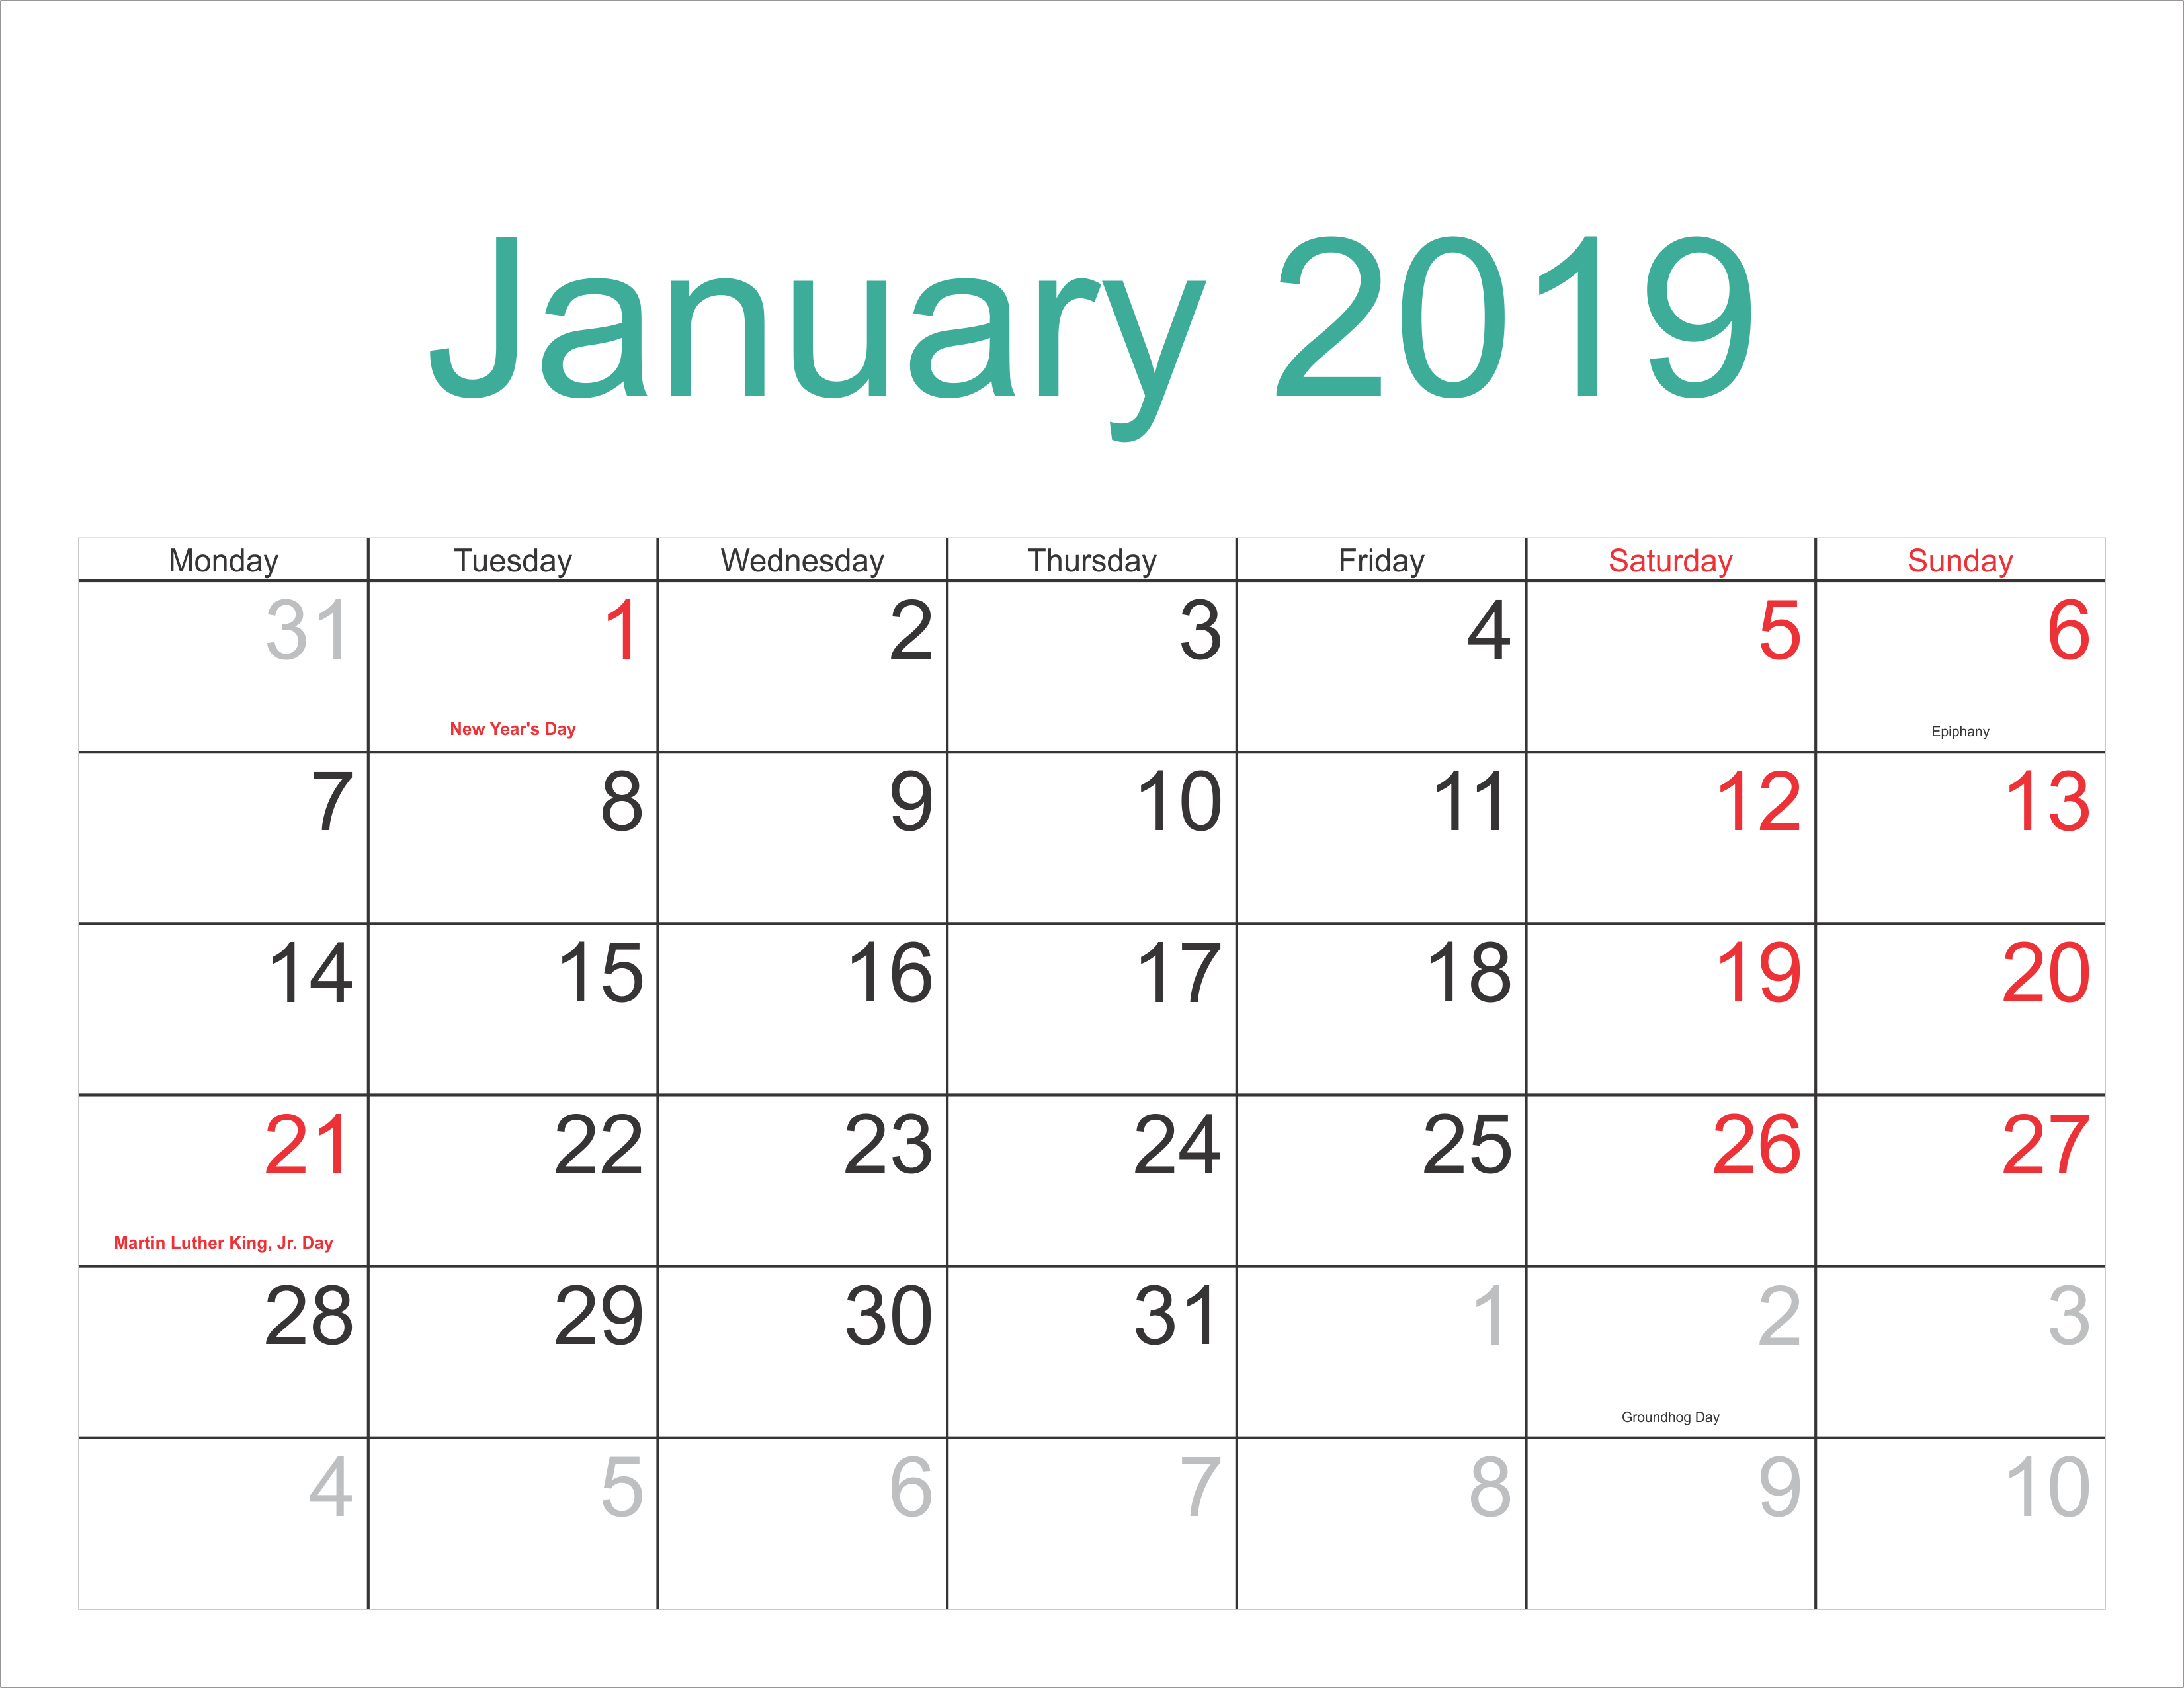 January 2019 Calendar Template With Holidays - Free Printable in January Calendar Printable Template With Holidays